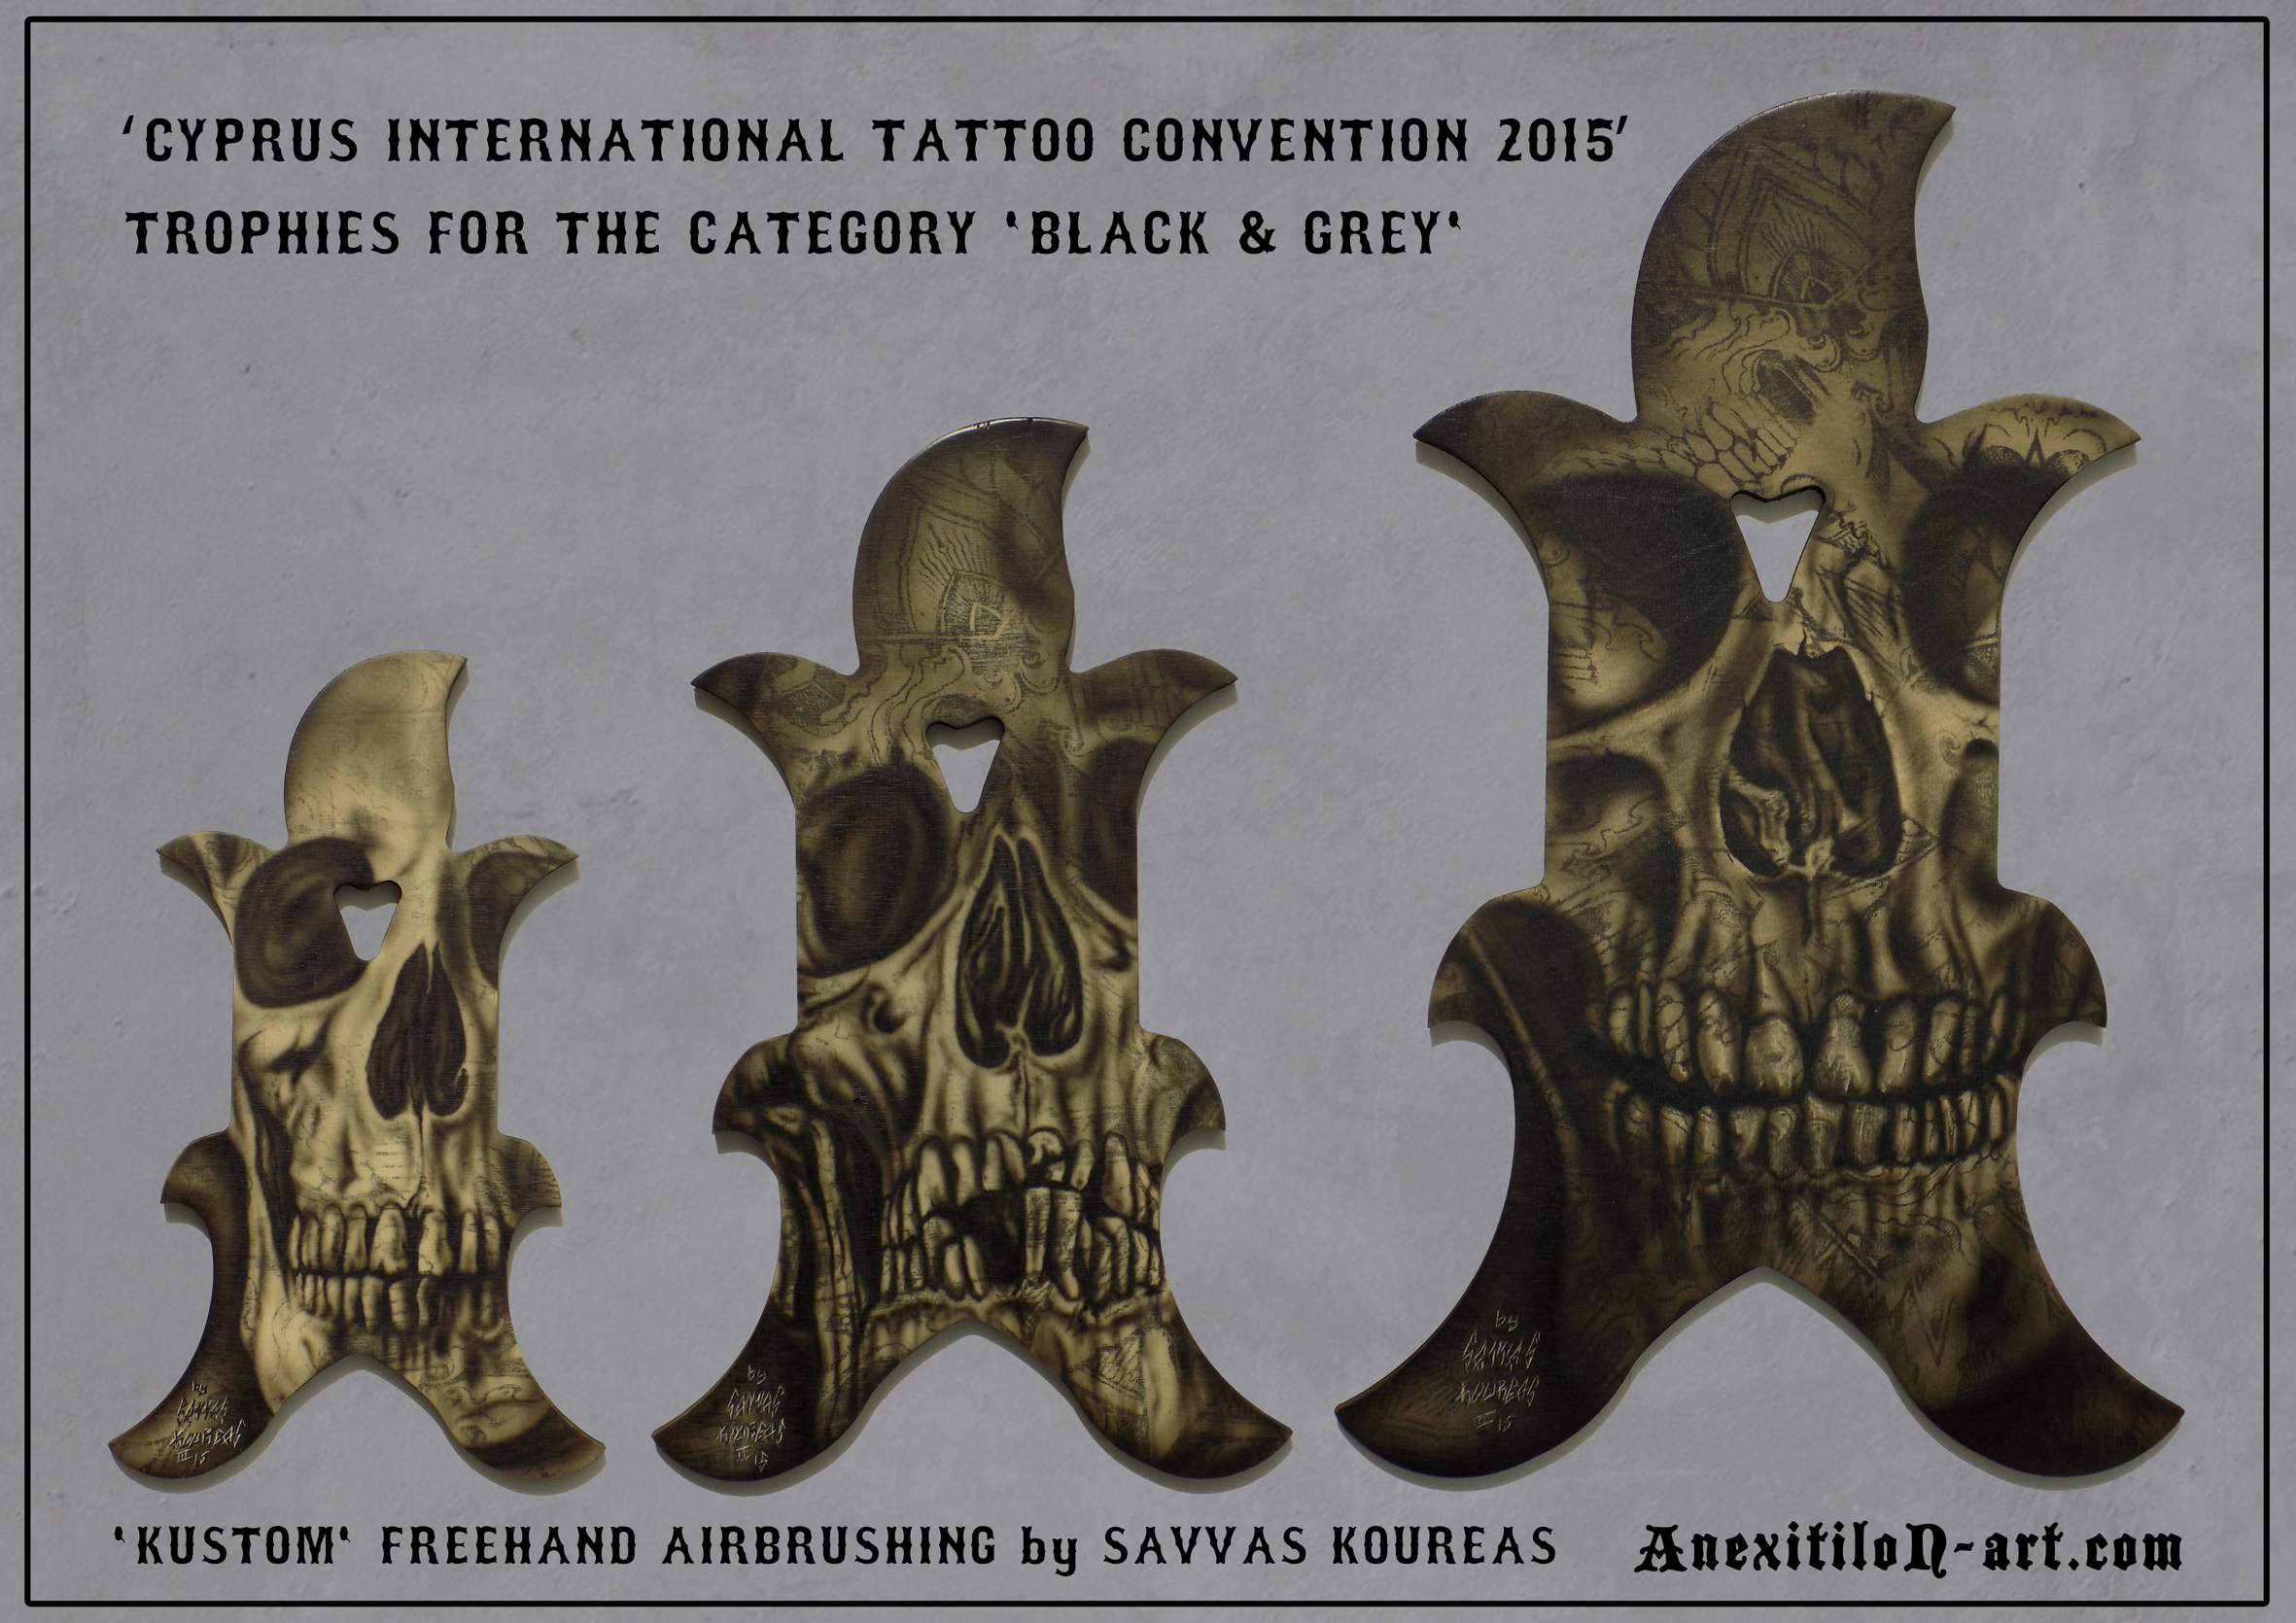 TATTOO CONVENTION TROPHIES by Savvas Koureas